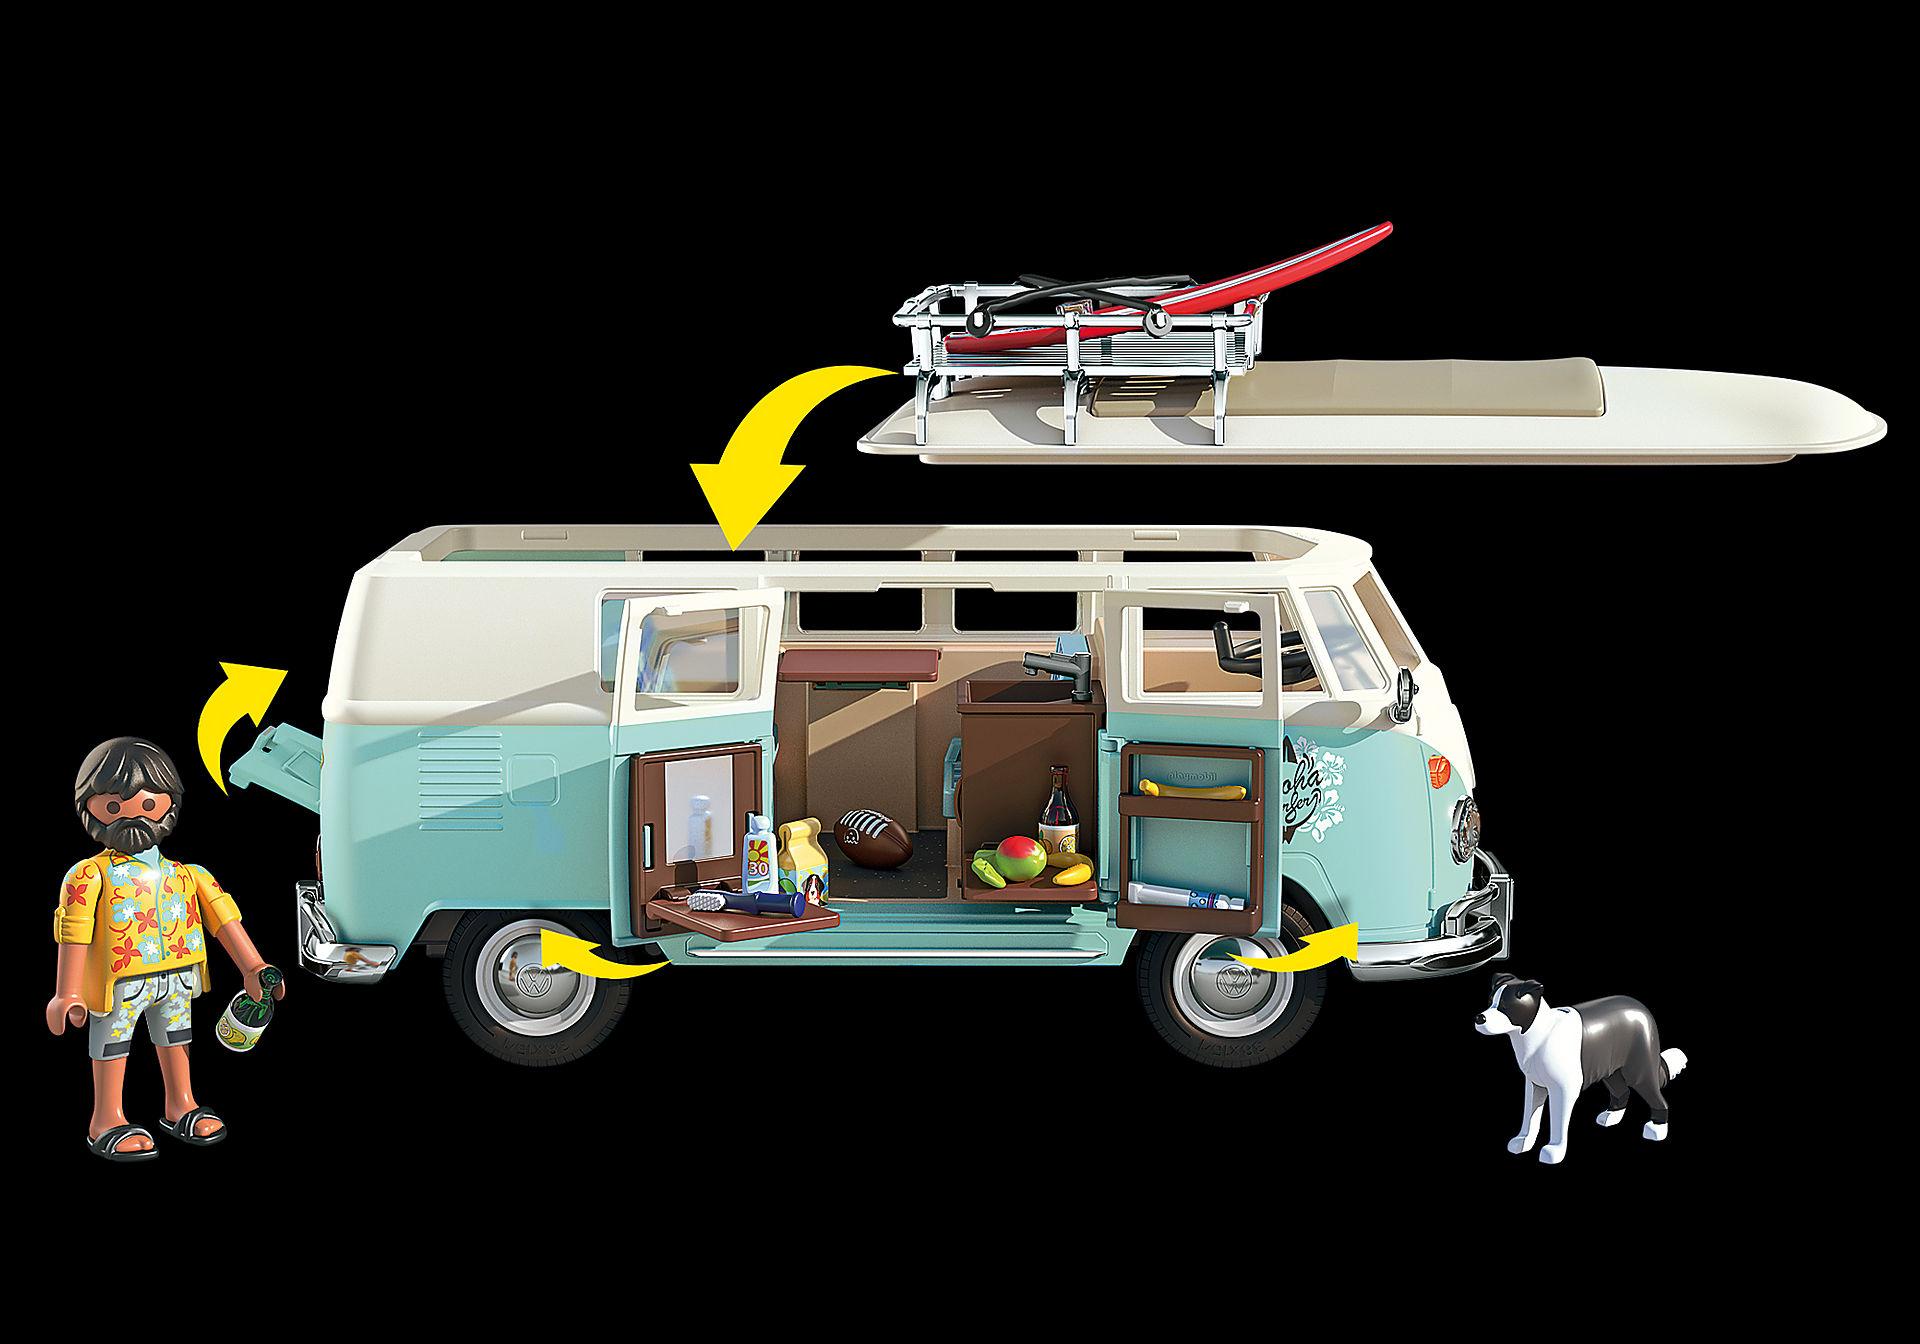 70826 Volkswagen T1 Camping Bus - Edycja specjalna zoom image5